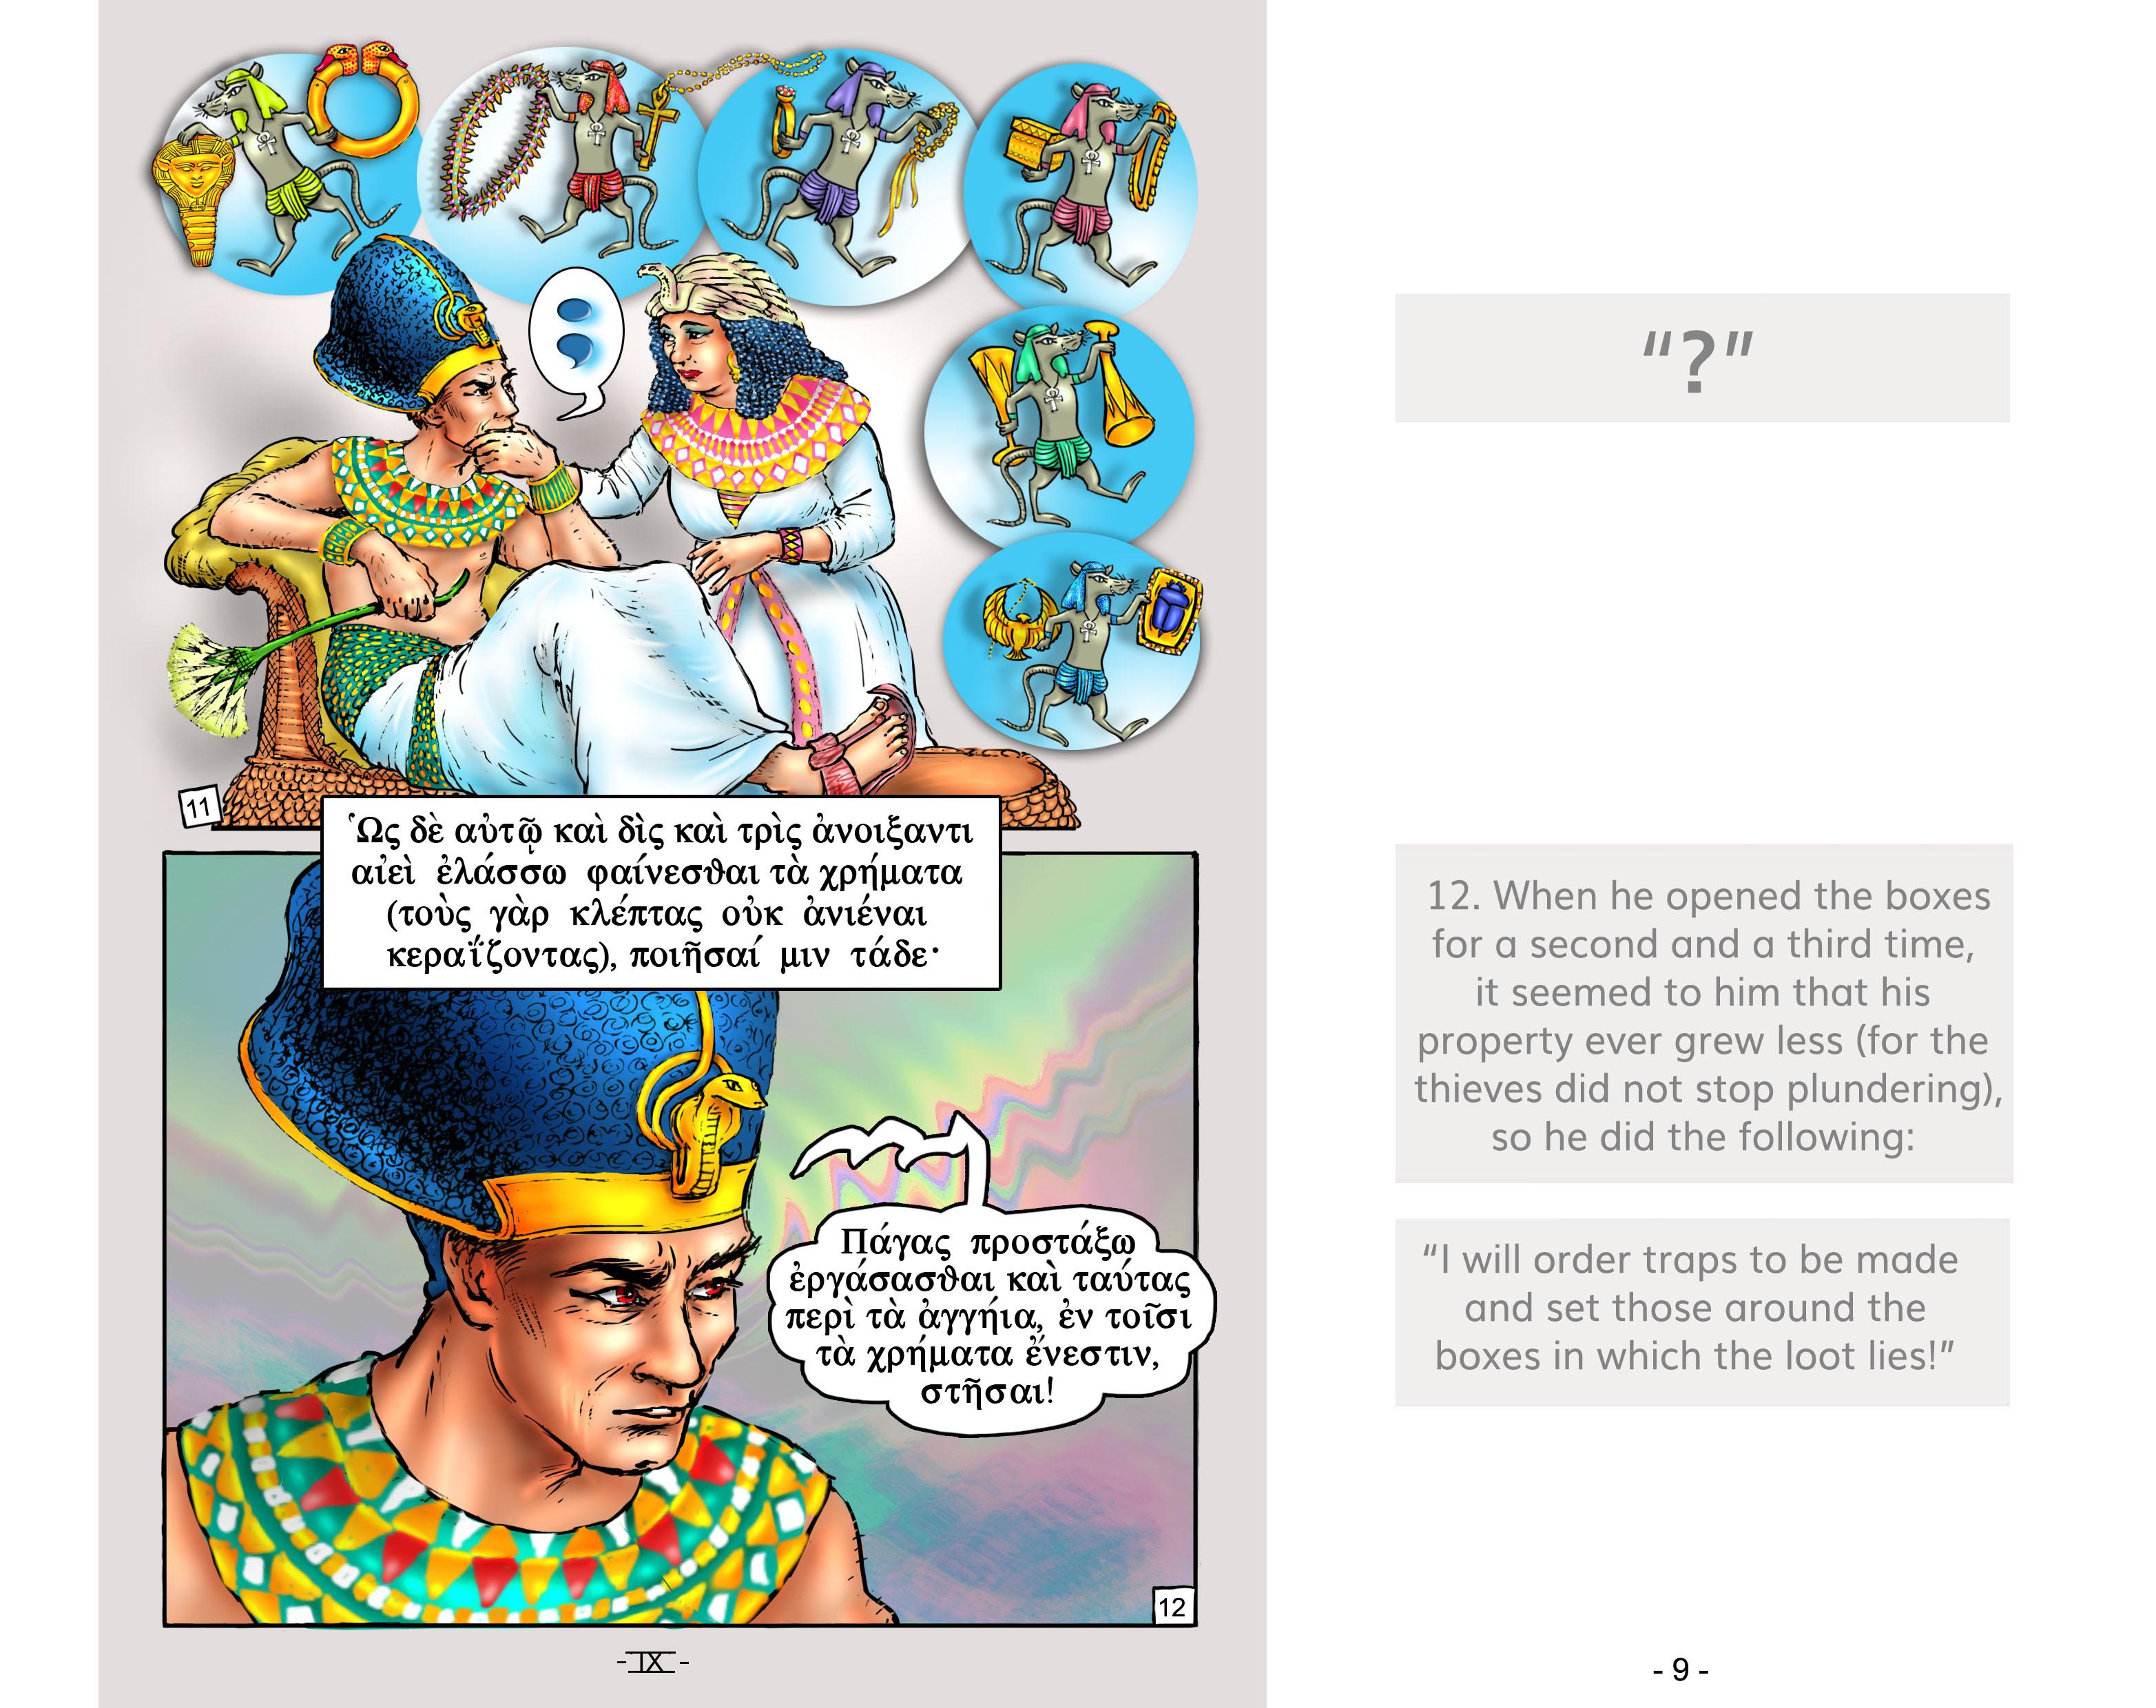 Herodotus, Historiai, the smart thief, de slimme dief, Historiën boek 2 Euterpe, Egyptische koning Rampsinitos, Egyptian farao Rhampsinitos, schatkamer, afgehakt hoofd en arm